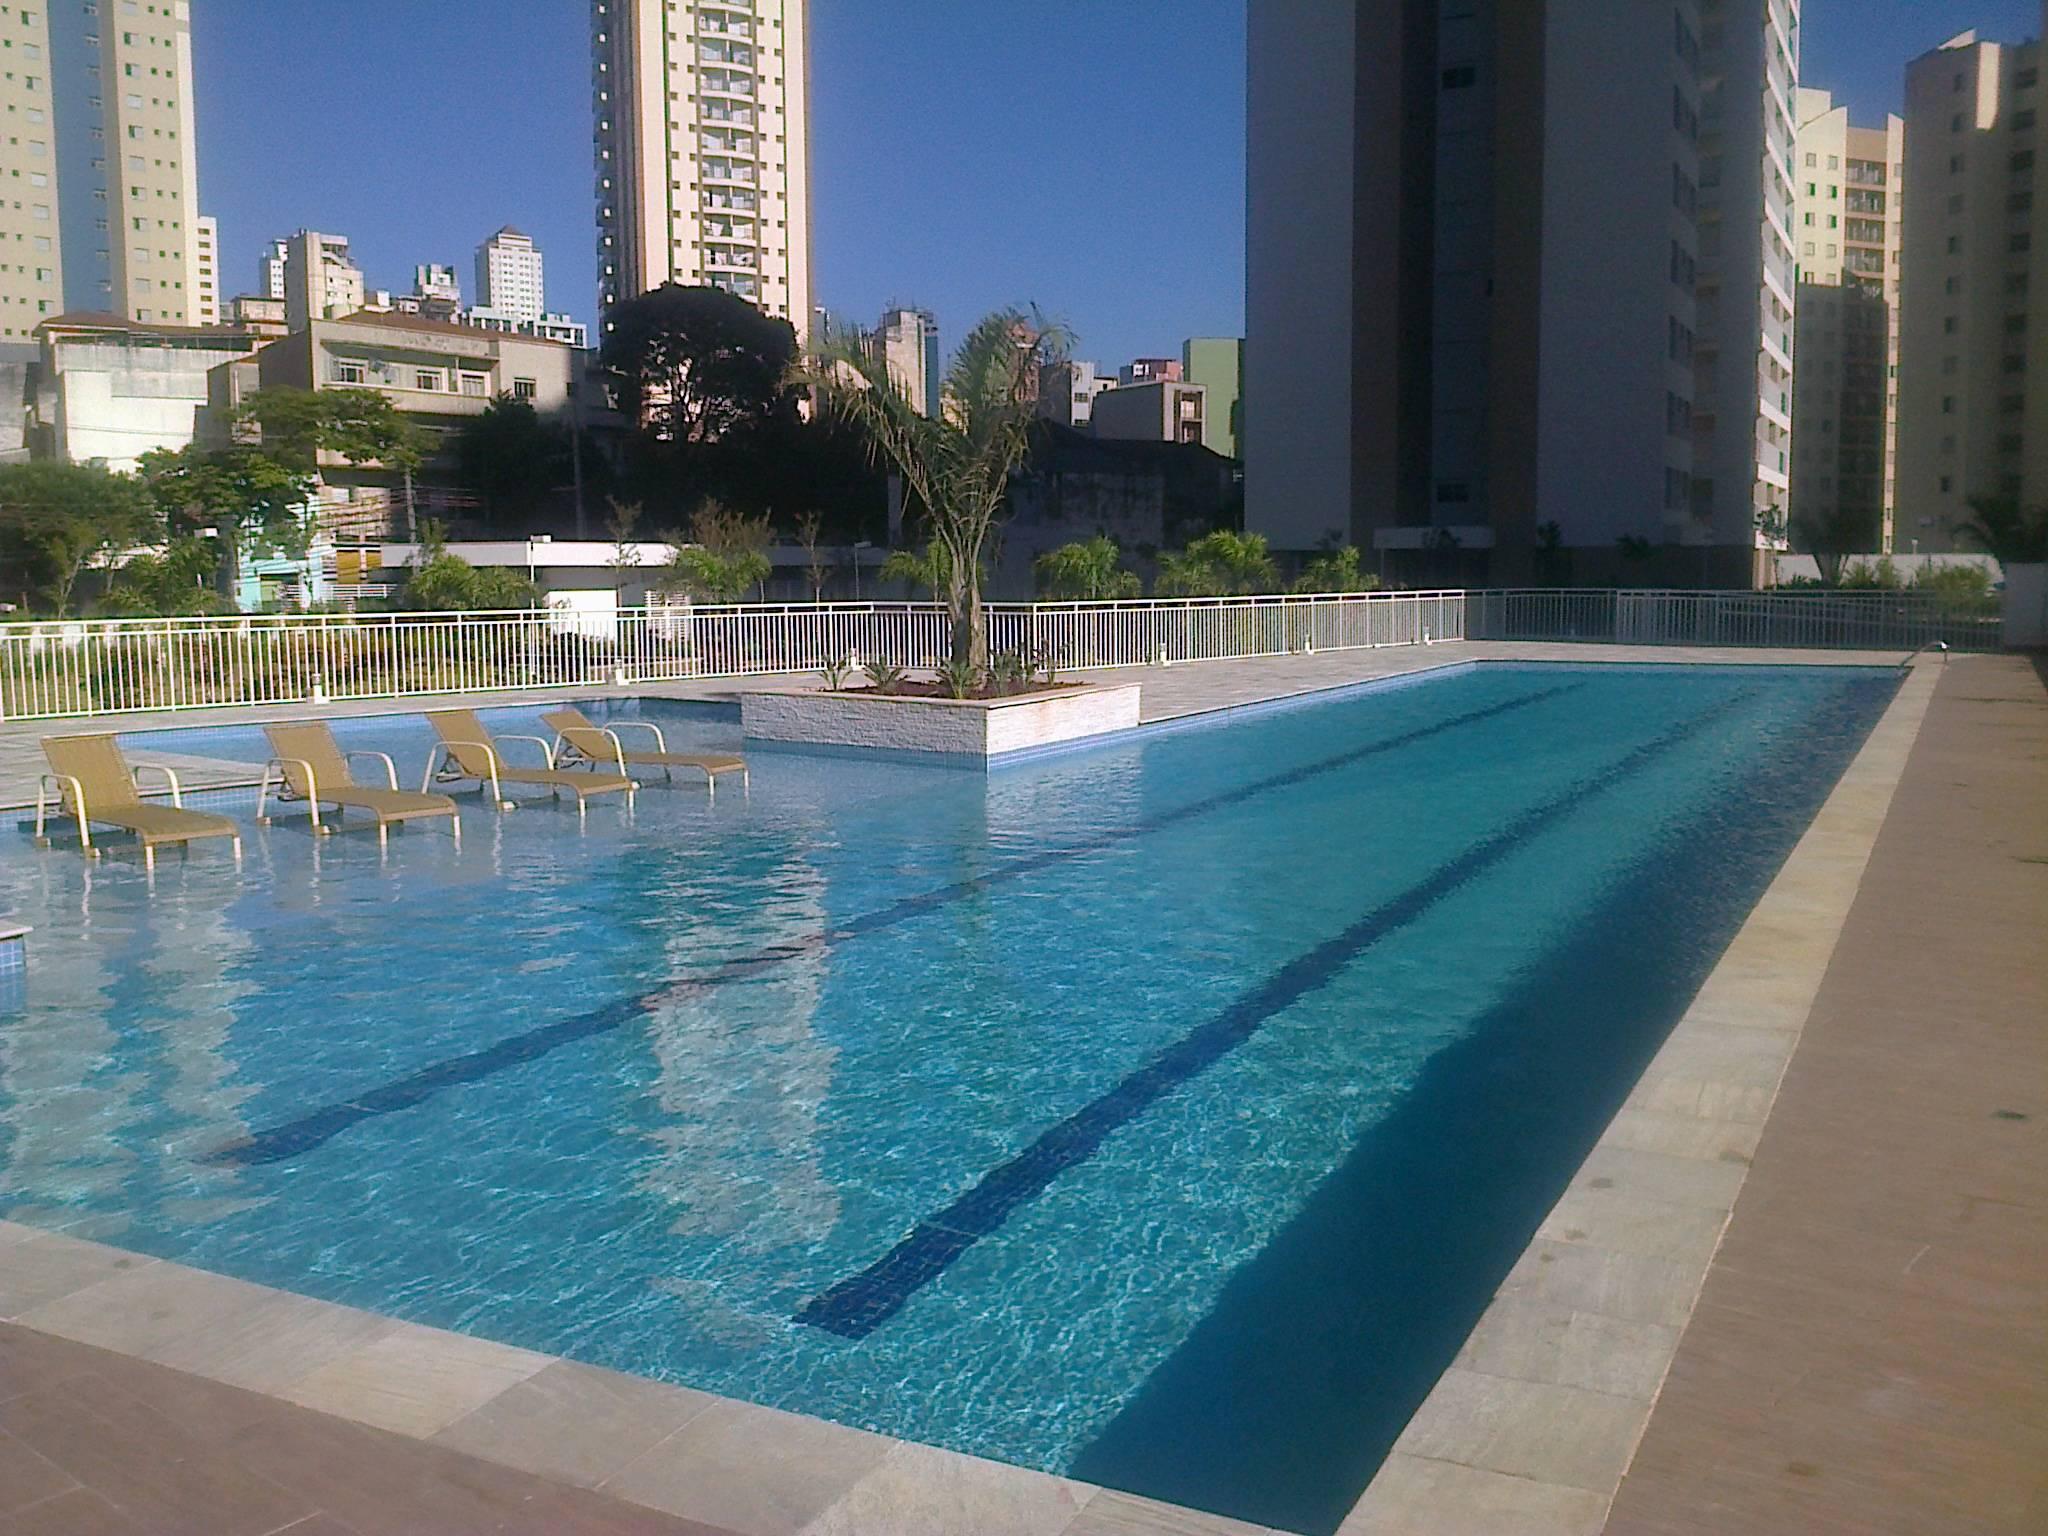 Servi o de limpeza de piscinas qualy tratus piscinas for Empresas de piscinas